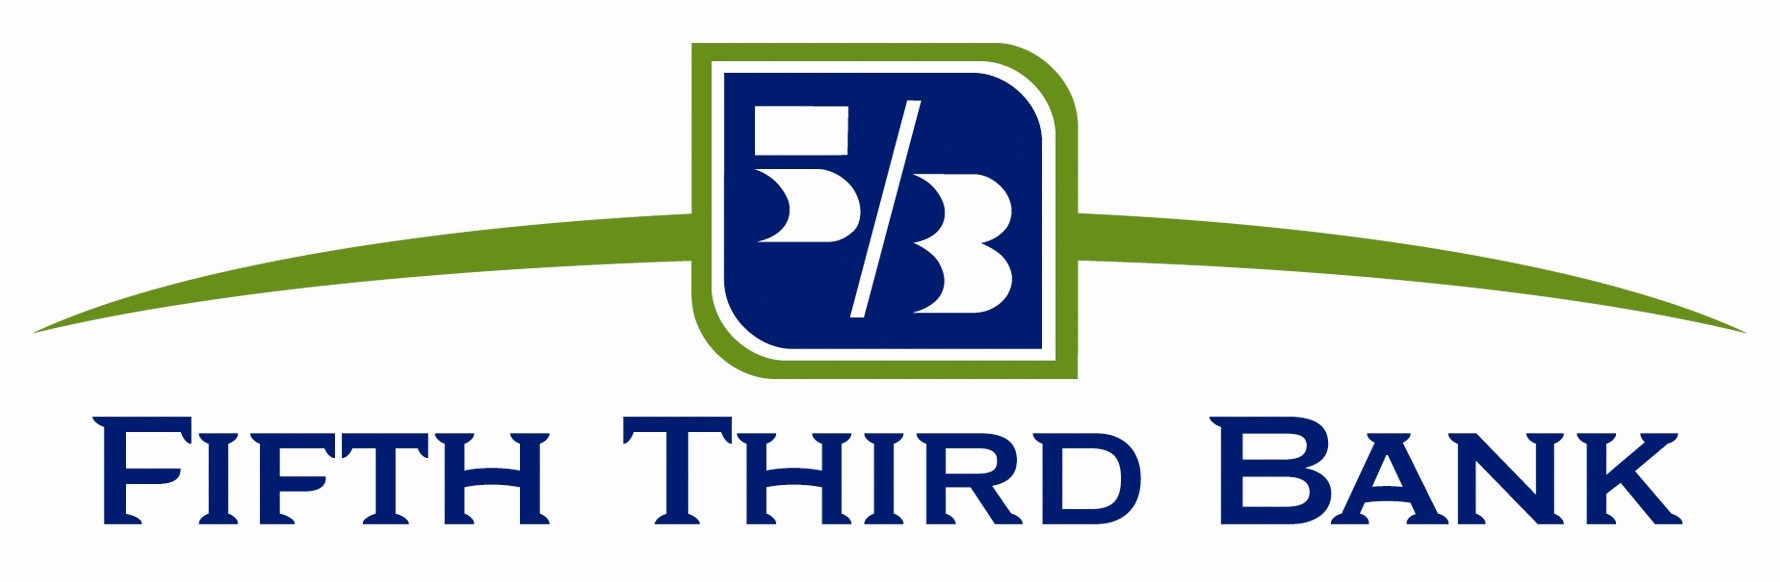 53 Logo.jpg